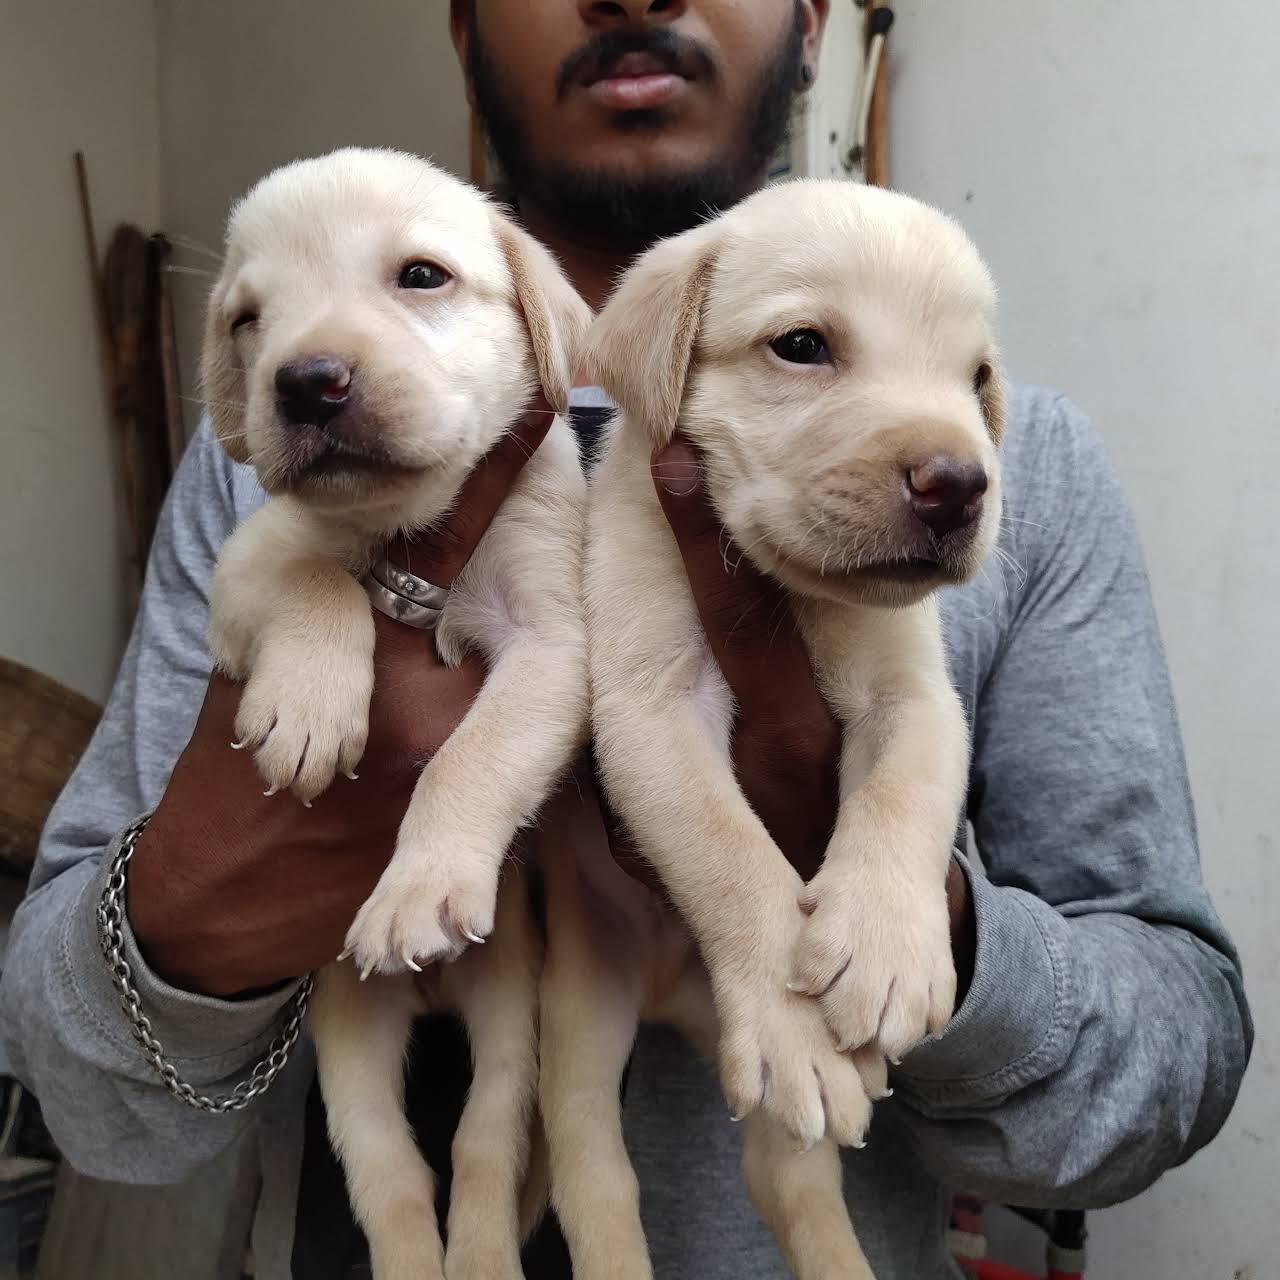 Home pets vellore & dog training center vellore - Pet Store